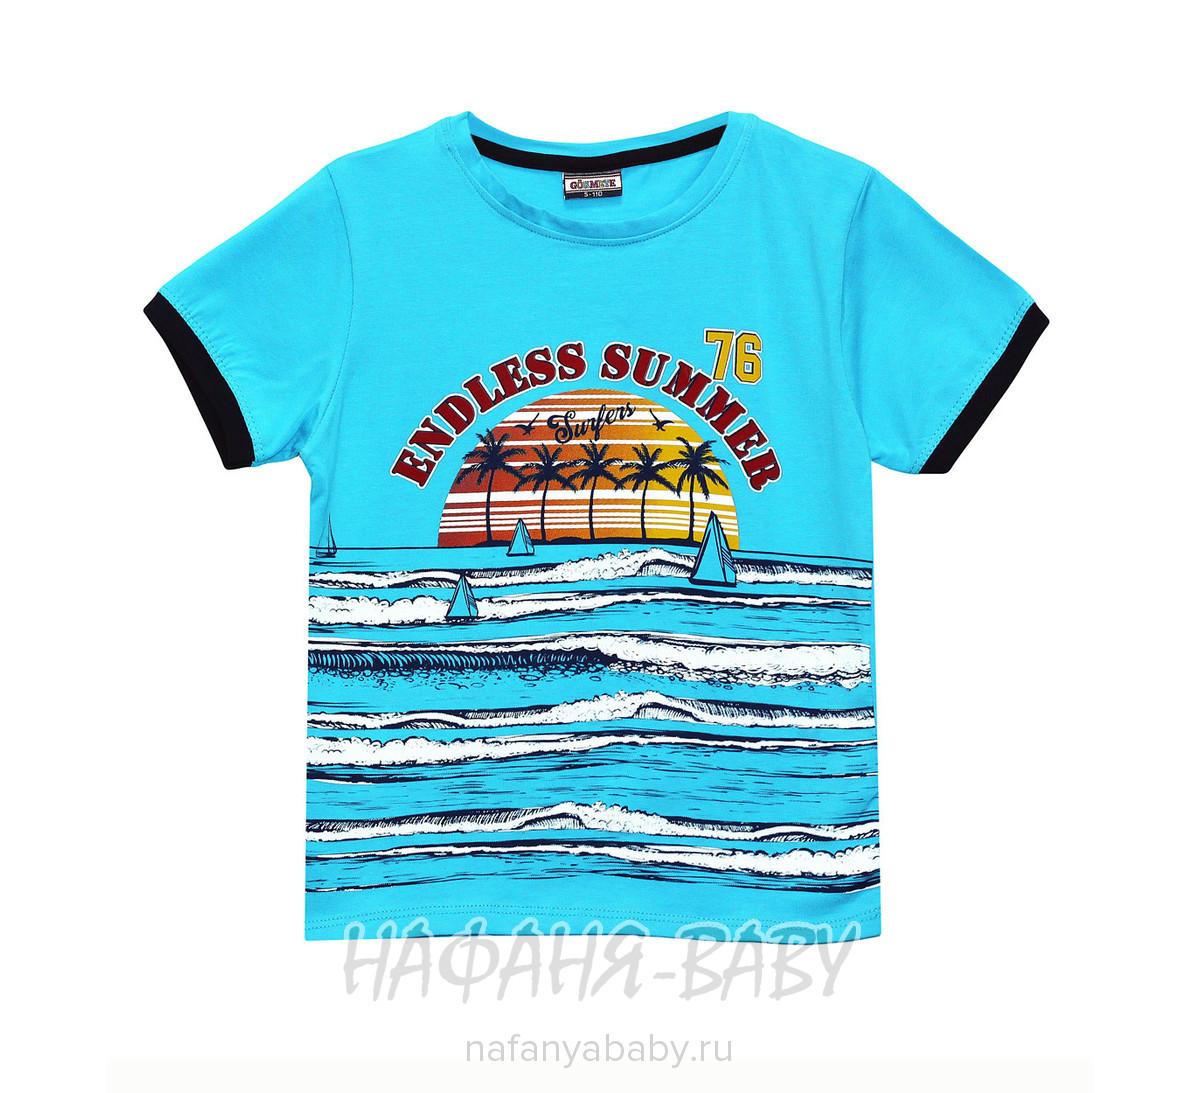 Детская футболка, артикул 7865 GOKMETE арт: 7865, 1-4 года, 5-9 лет, цвет белый, оптом Турция